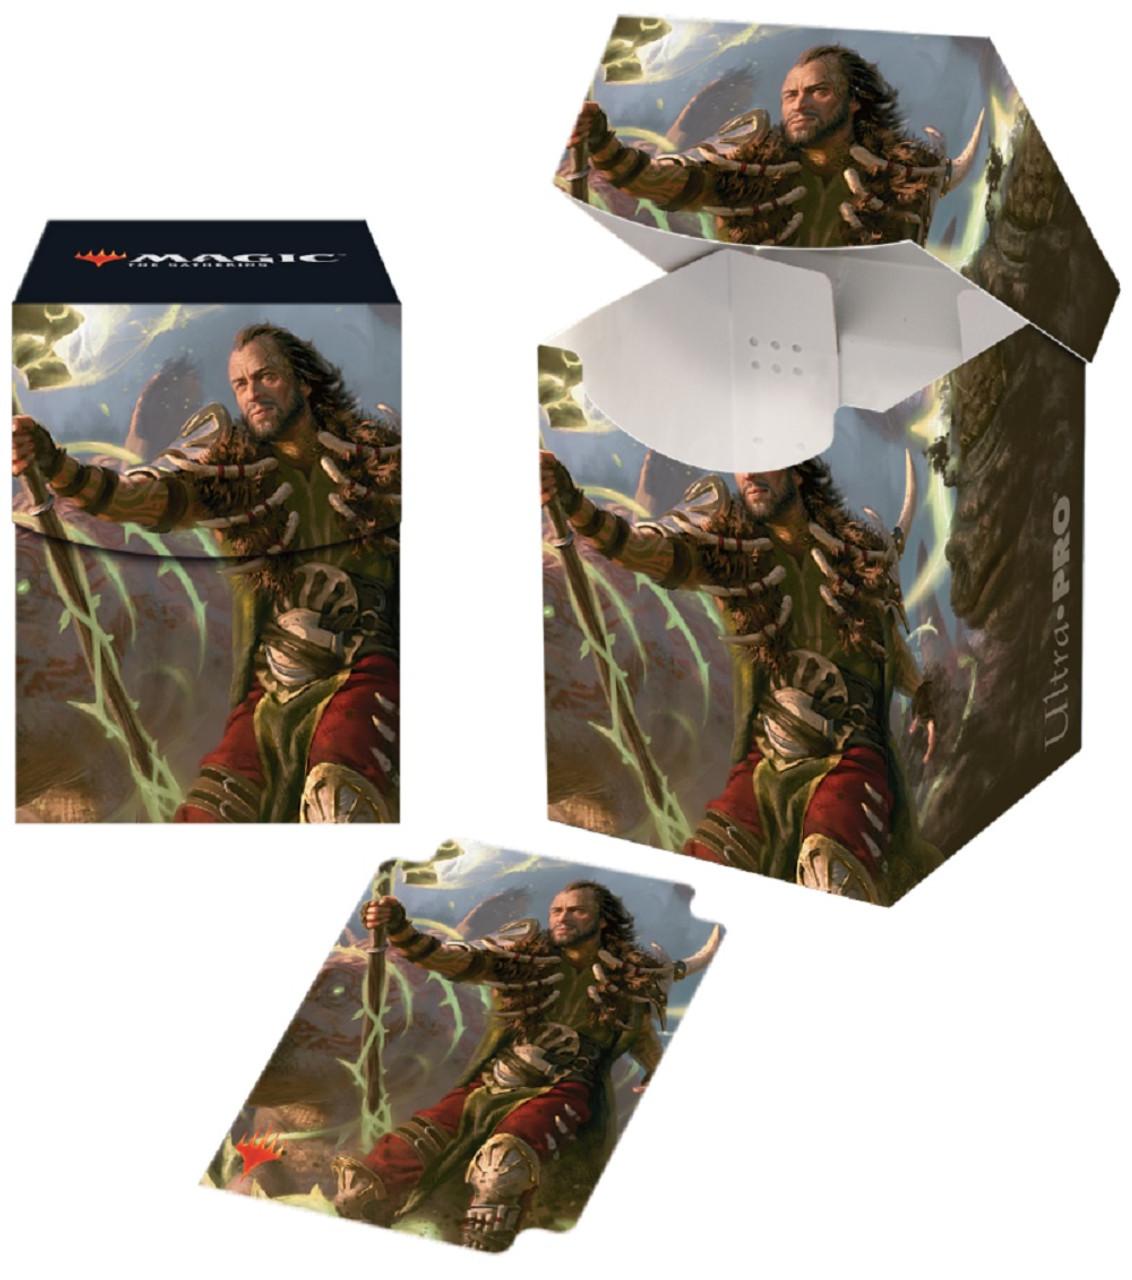 Magic: The Gathering - Commander 2019 V4 PRO 100+ Deck Box - Special Order